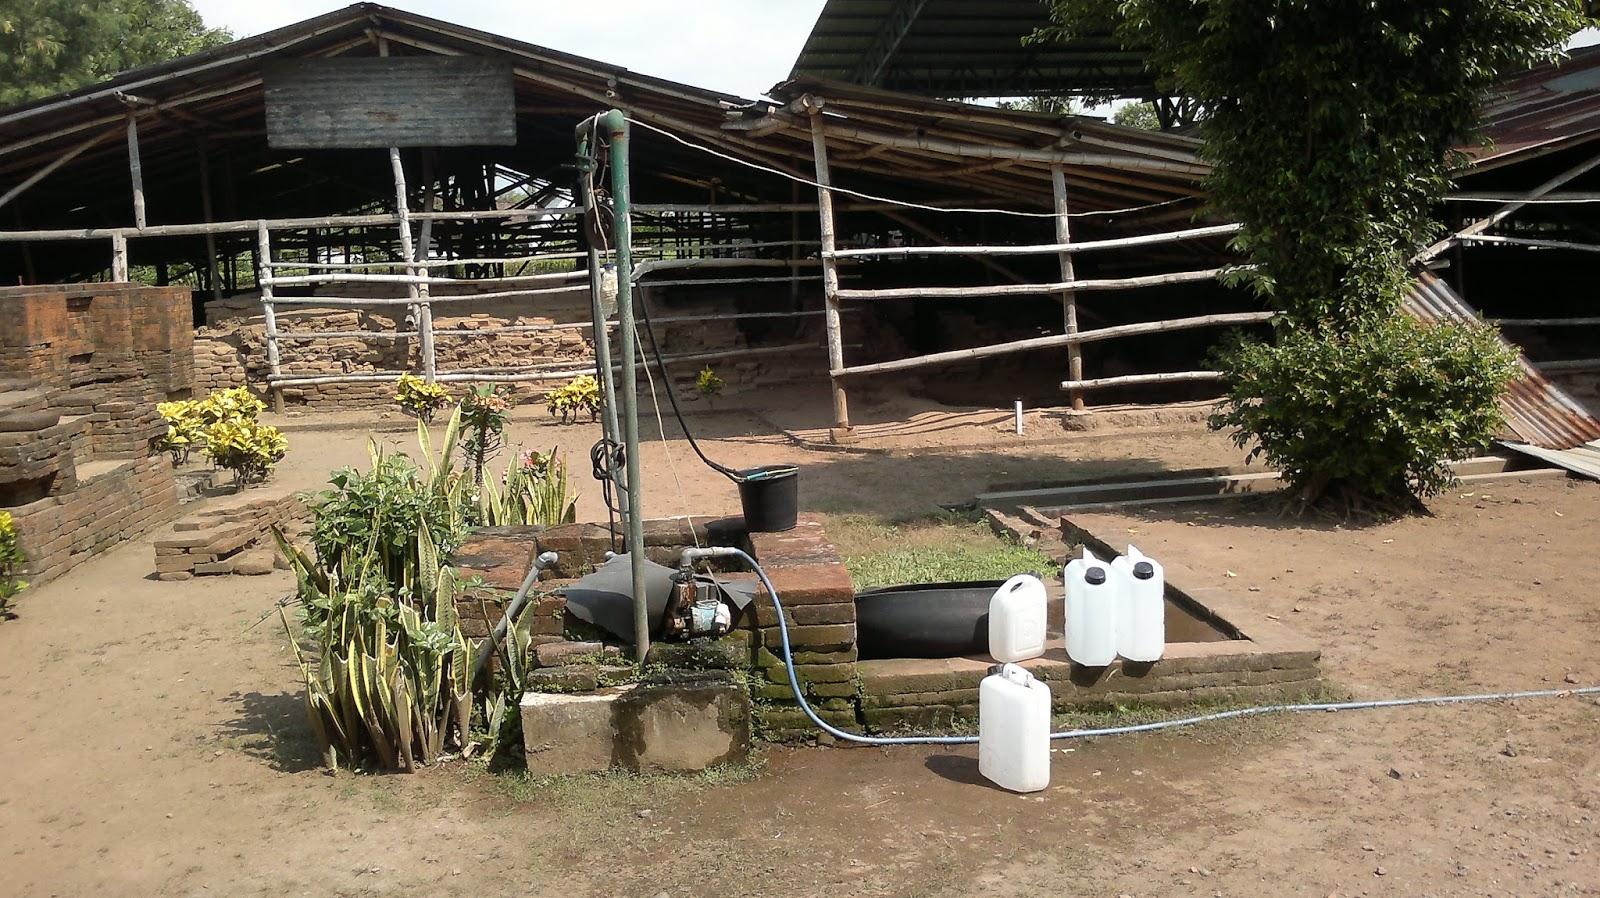 Petualangan Ali Topan Candi Kedaton Bekas Pemukiman Majapahit Sumur Upas